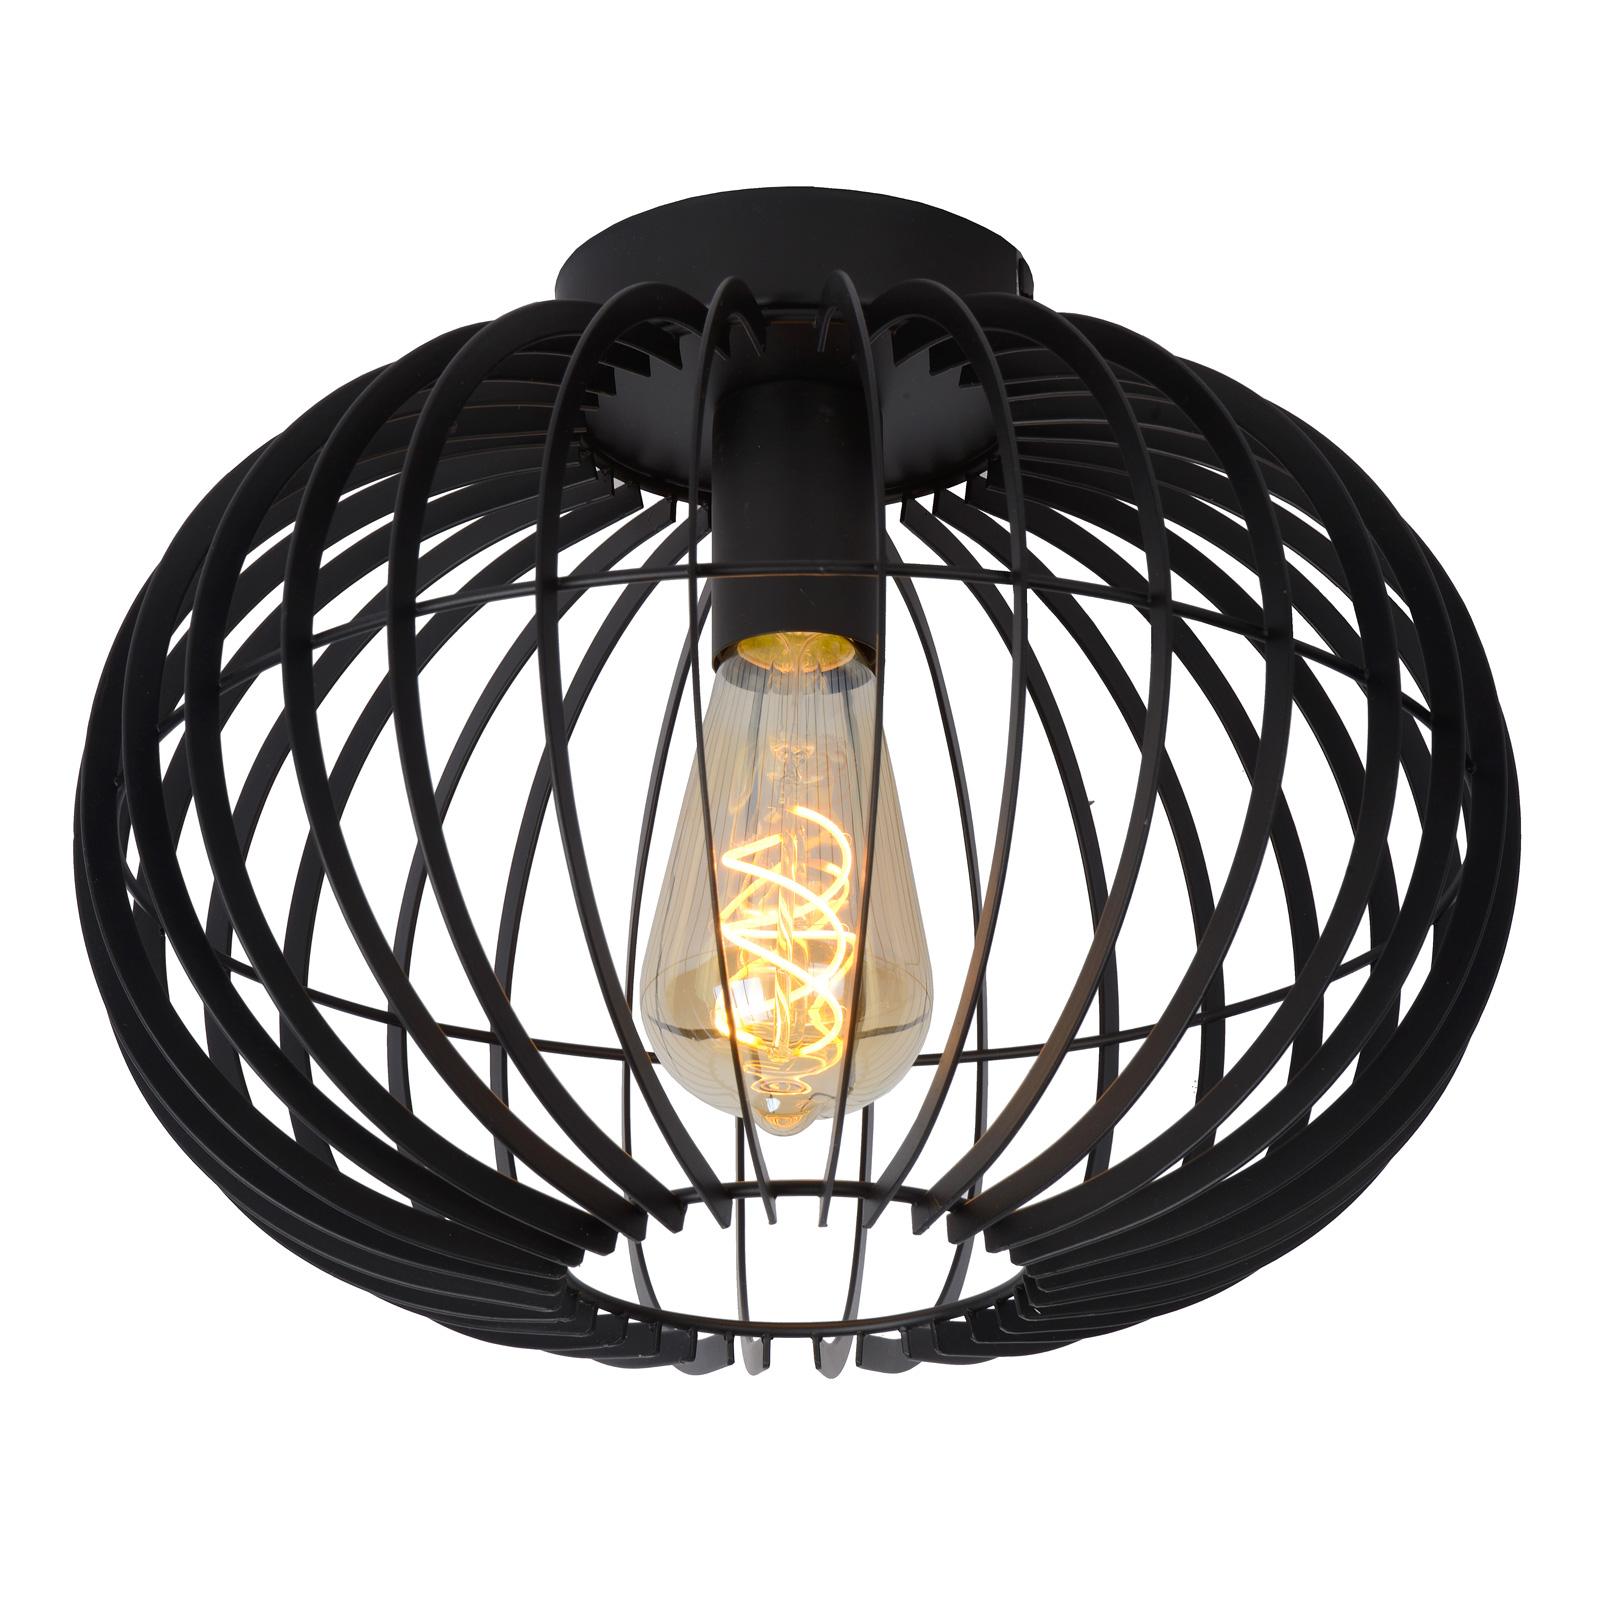 Reda taklampe svart Ø 32 cm